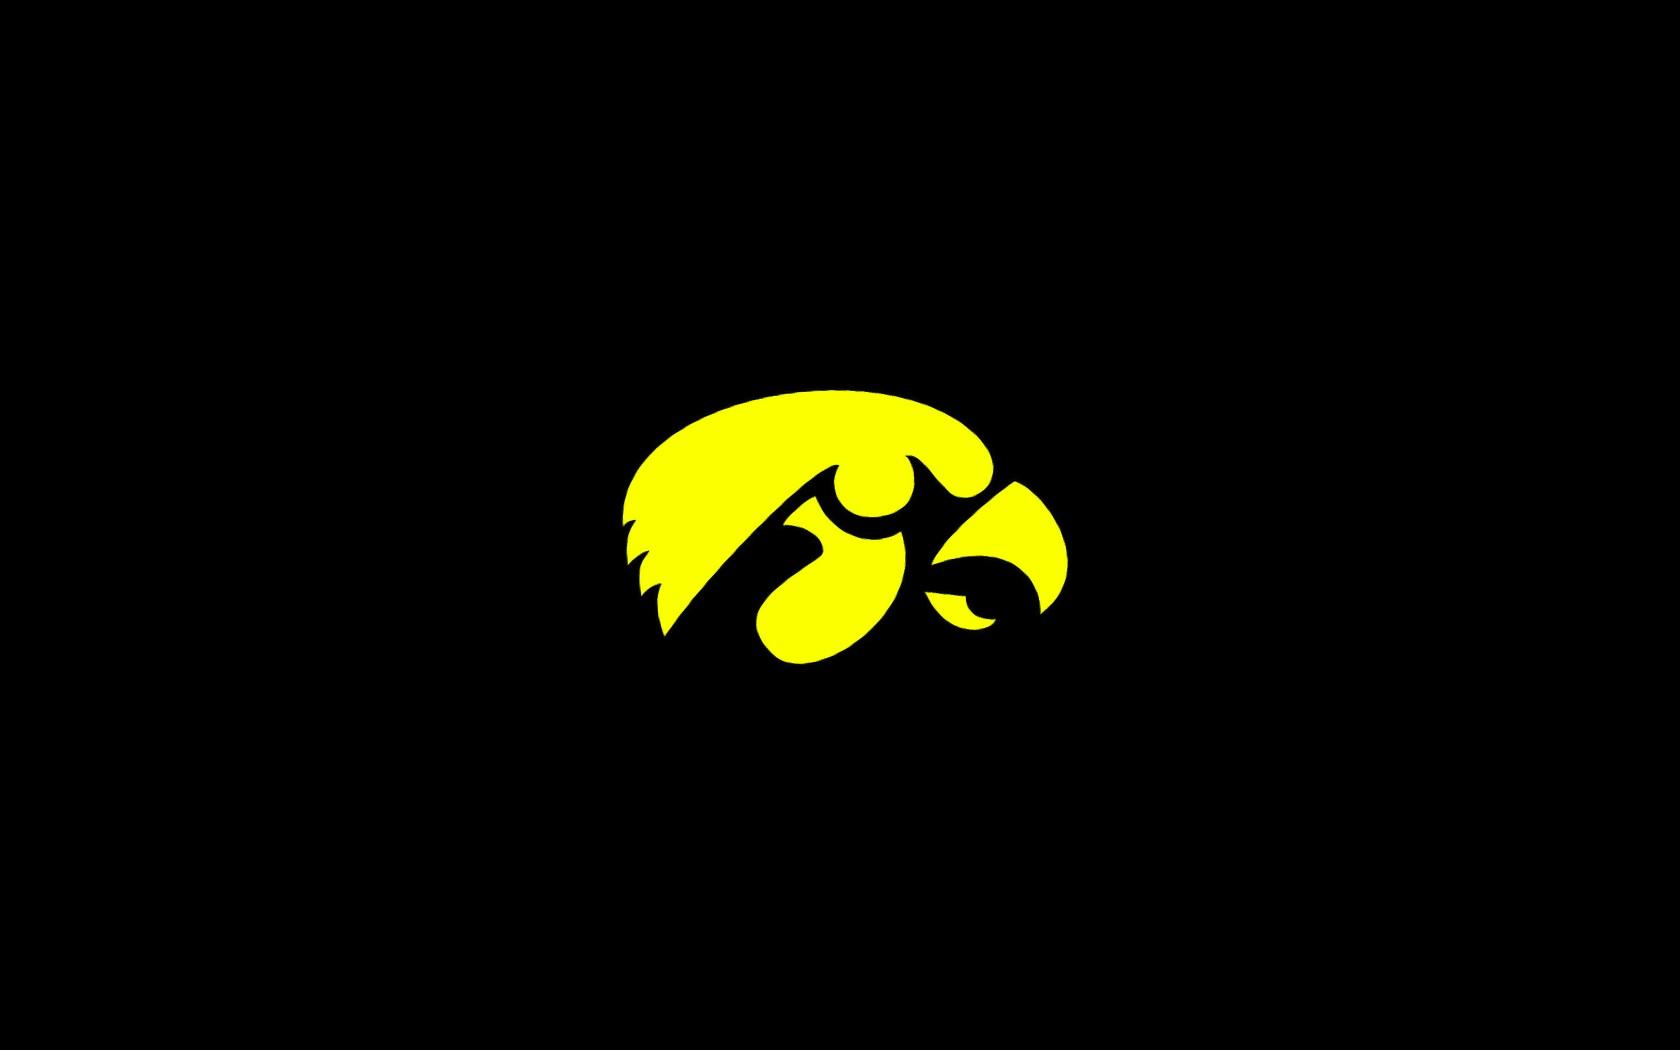 Iowa Hawkeye Herky Logo wallpaper002 1680x1050